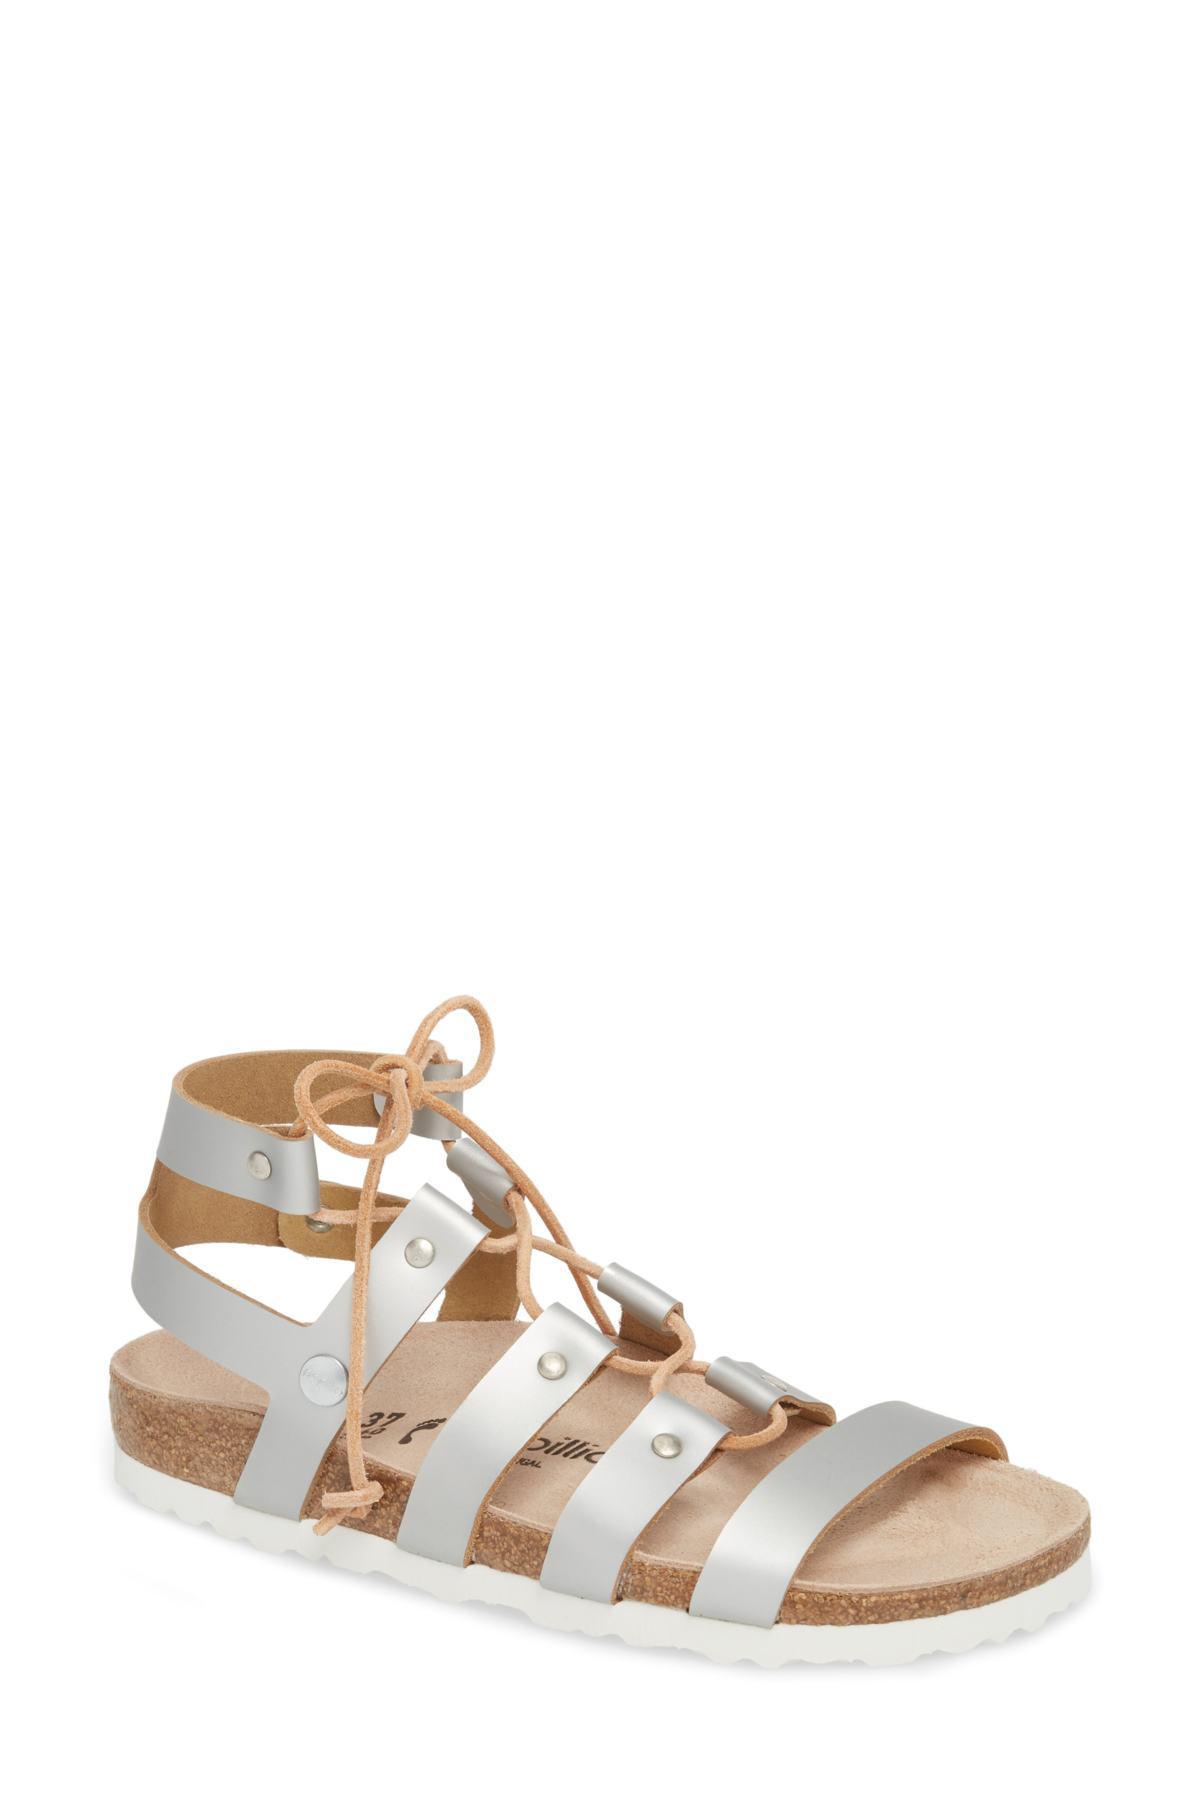 d2ad9434118 Birkenstock Papillio By Cleo Gladiator Sandal (women) in Metallic - Lyst